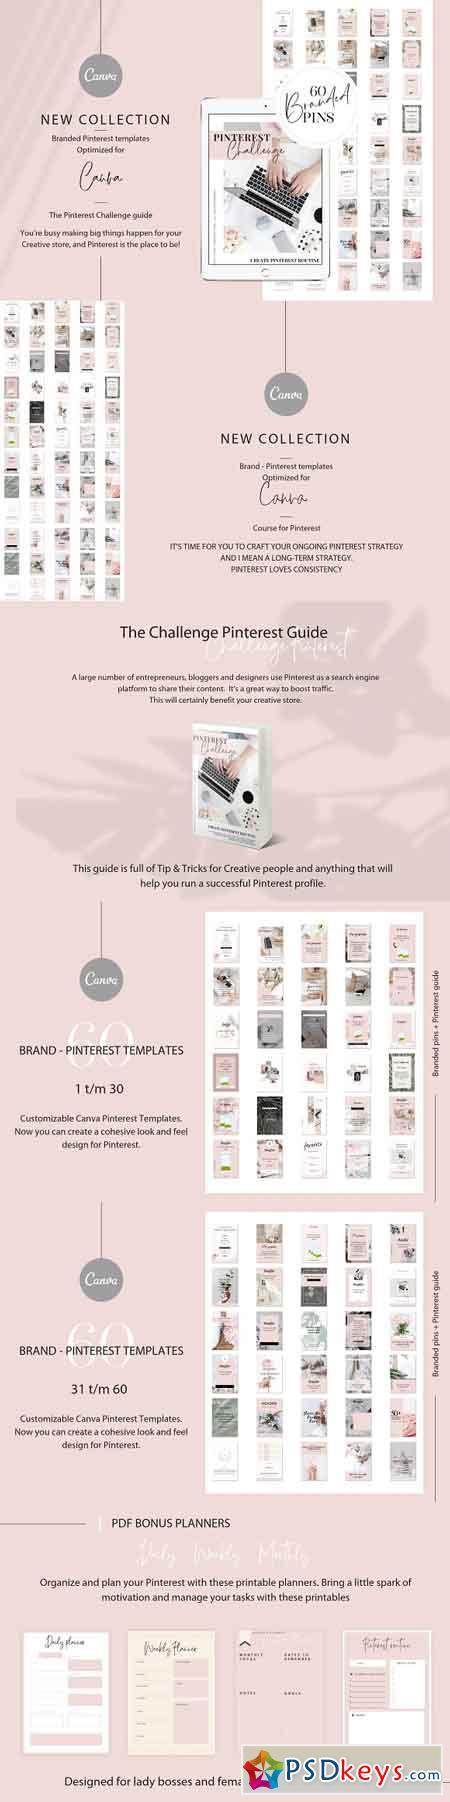 Branded pins + Pinterest guide 3118017